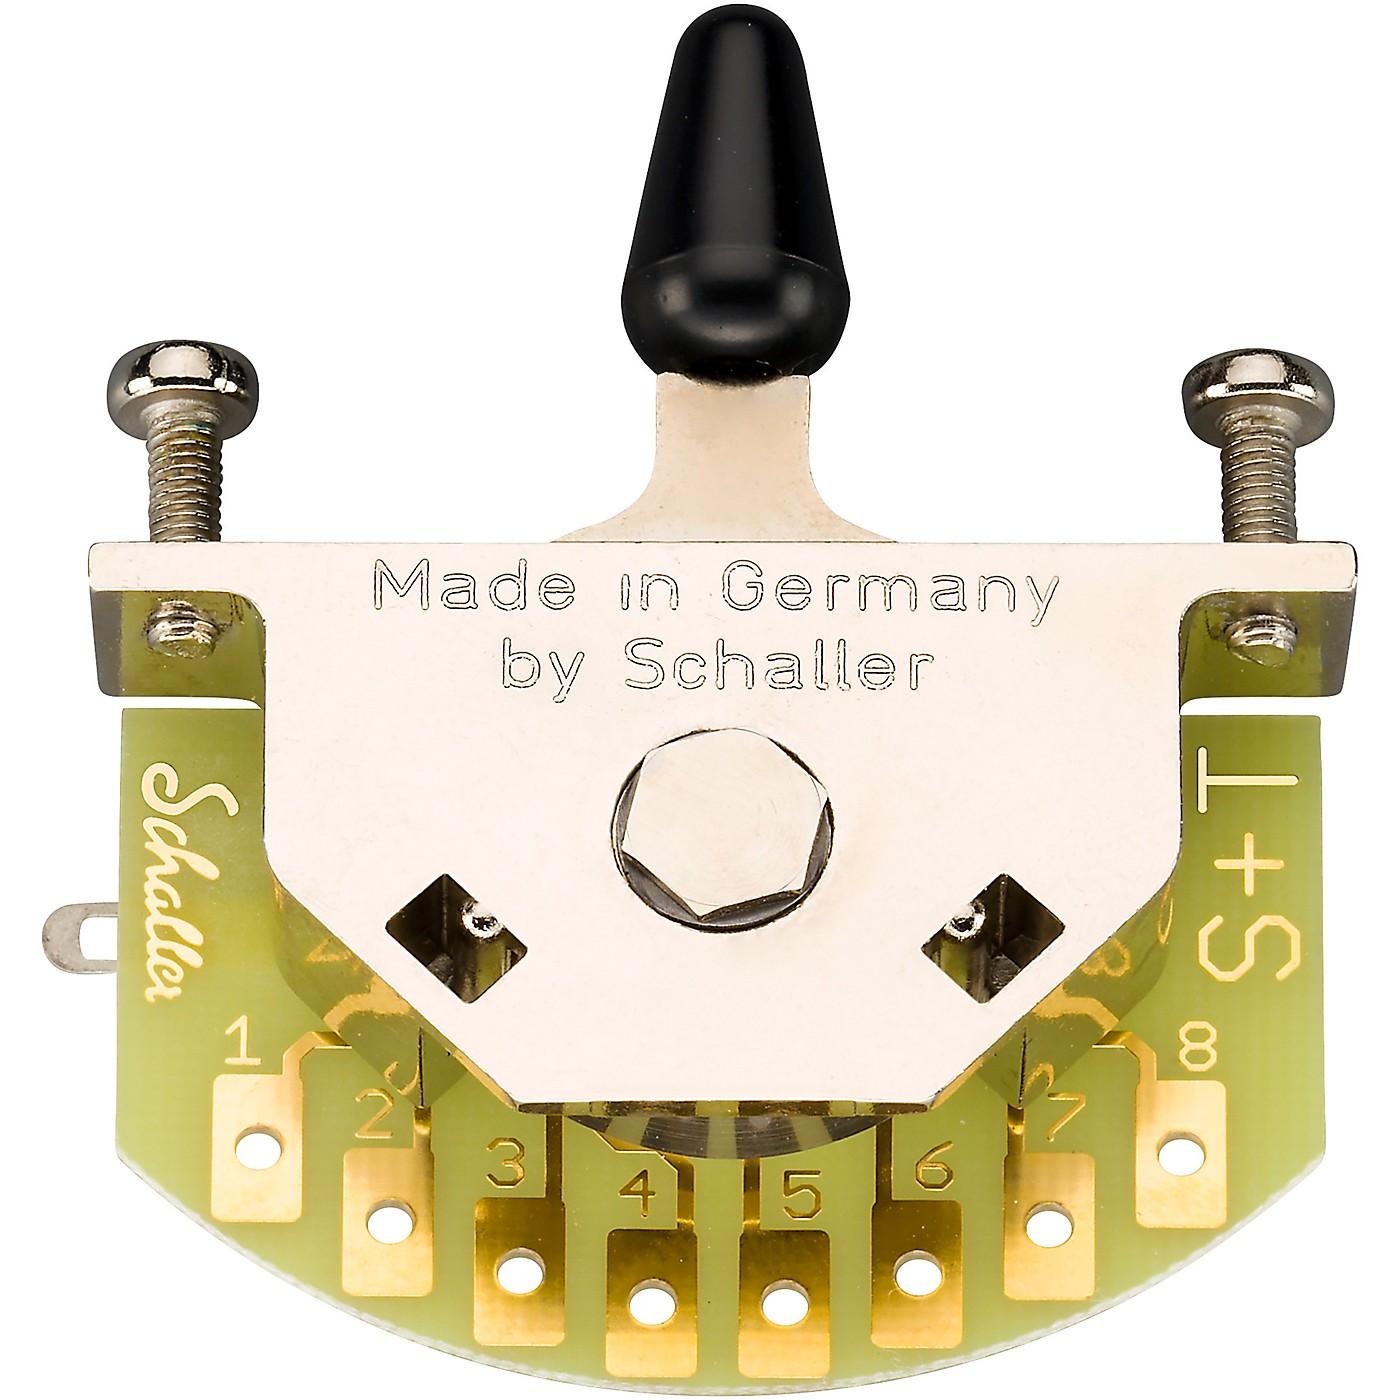 Schaller Megaswitch S (5-way) thumbnail